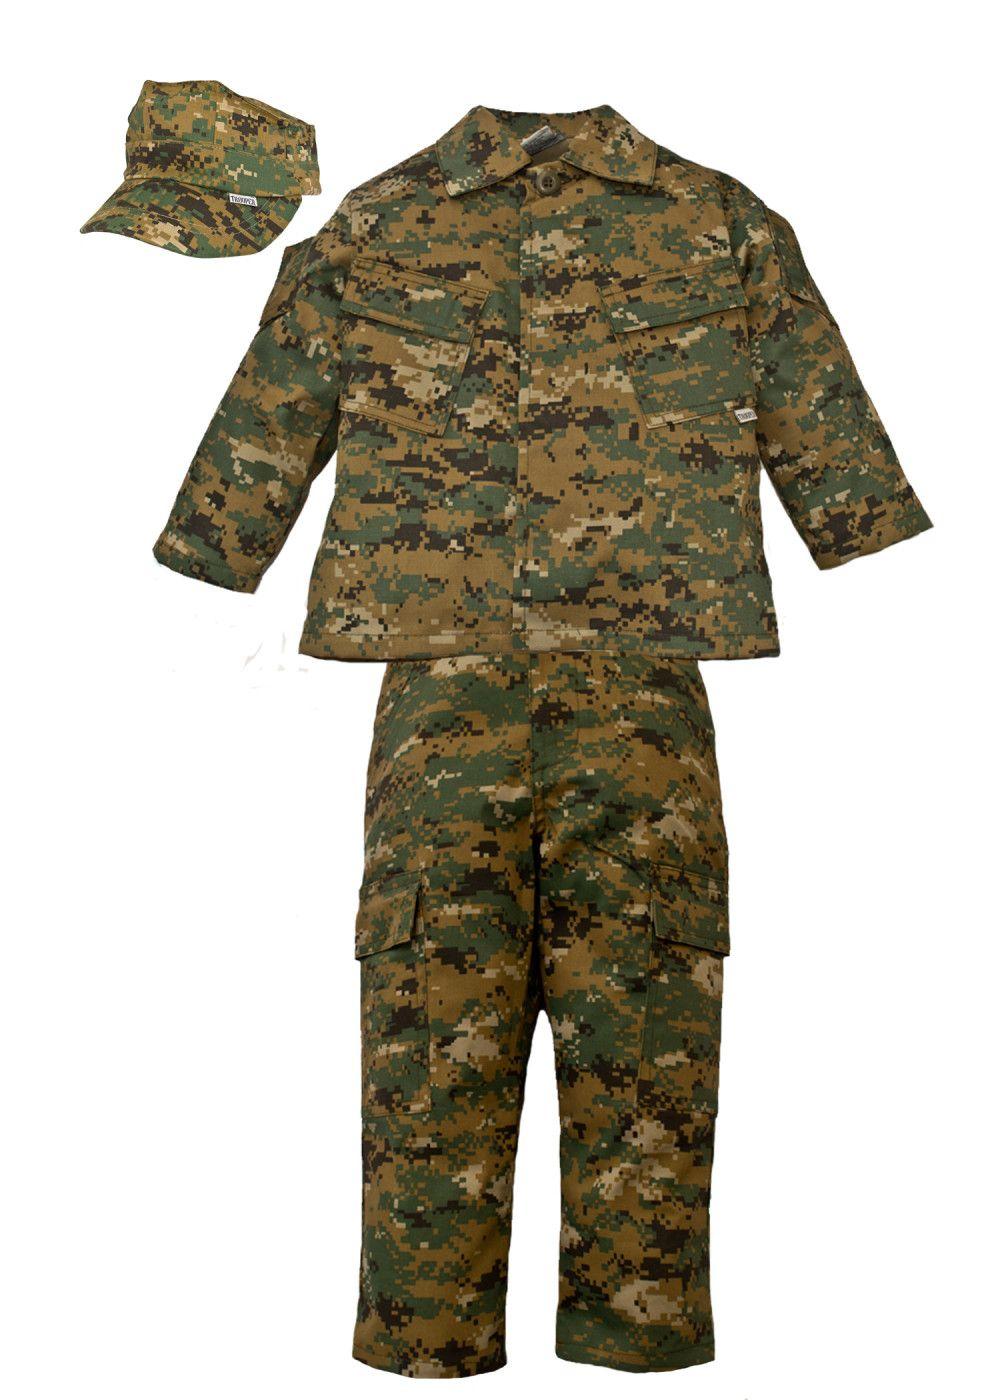 bab8b07ae0429 Marine Costume, Tactical Uniforms, Military Love, Military Jacket, Army  Surplus, Military